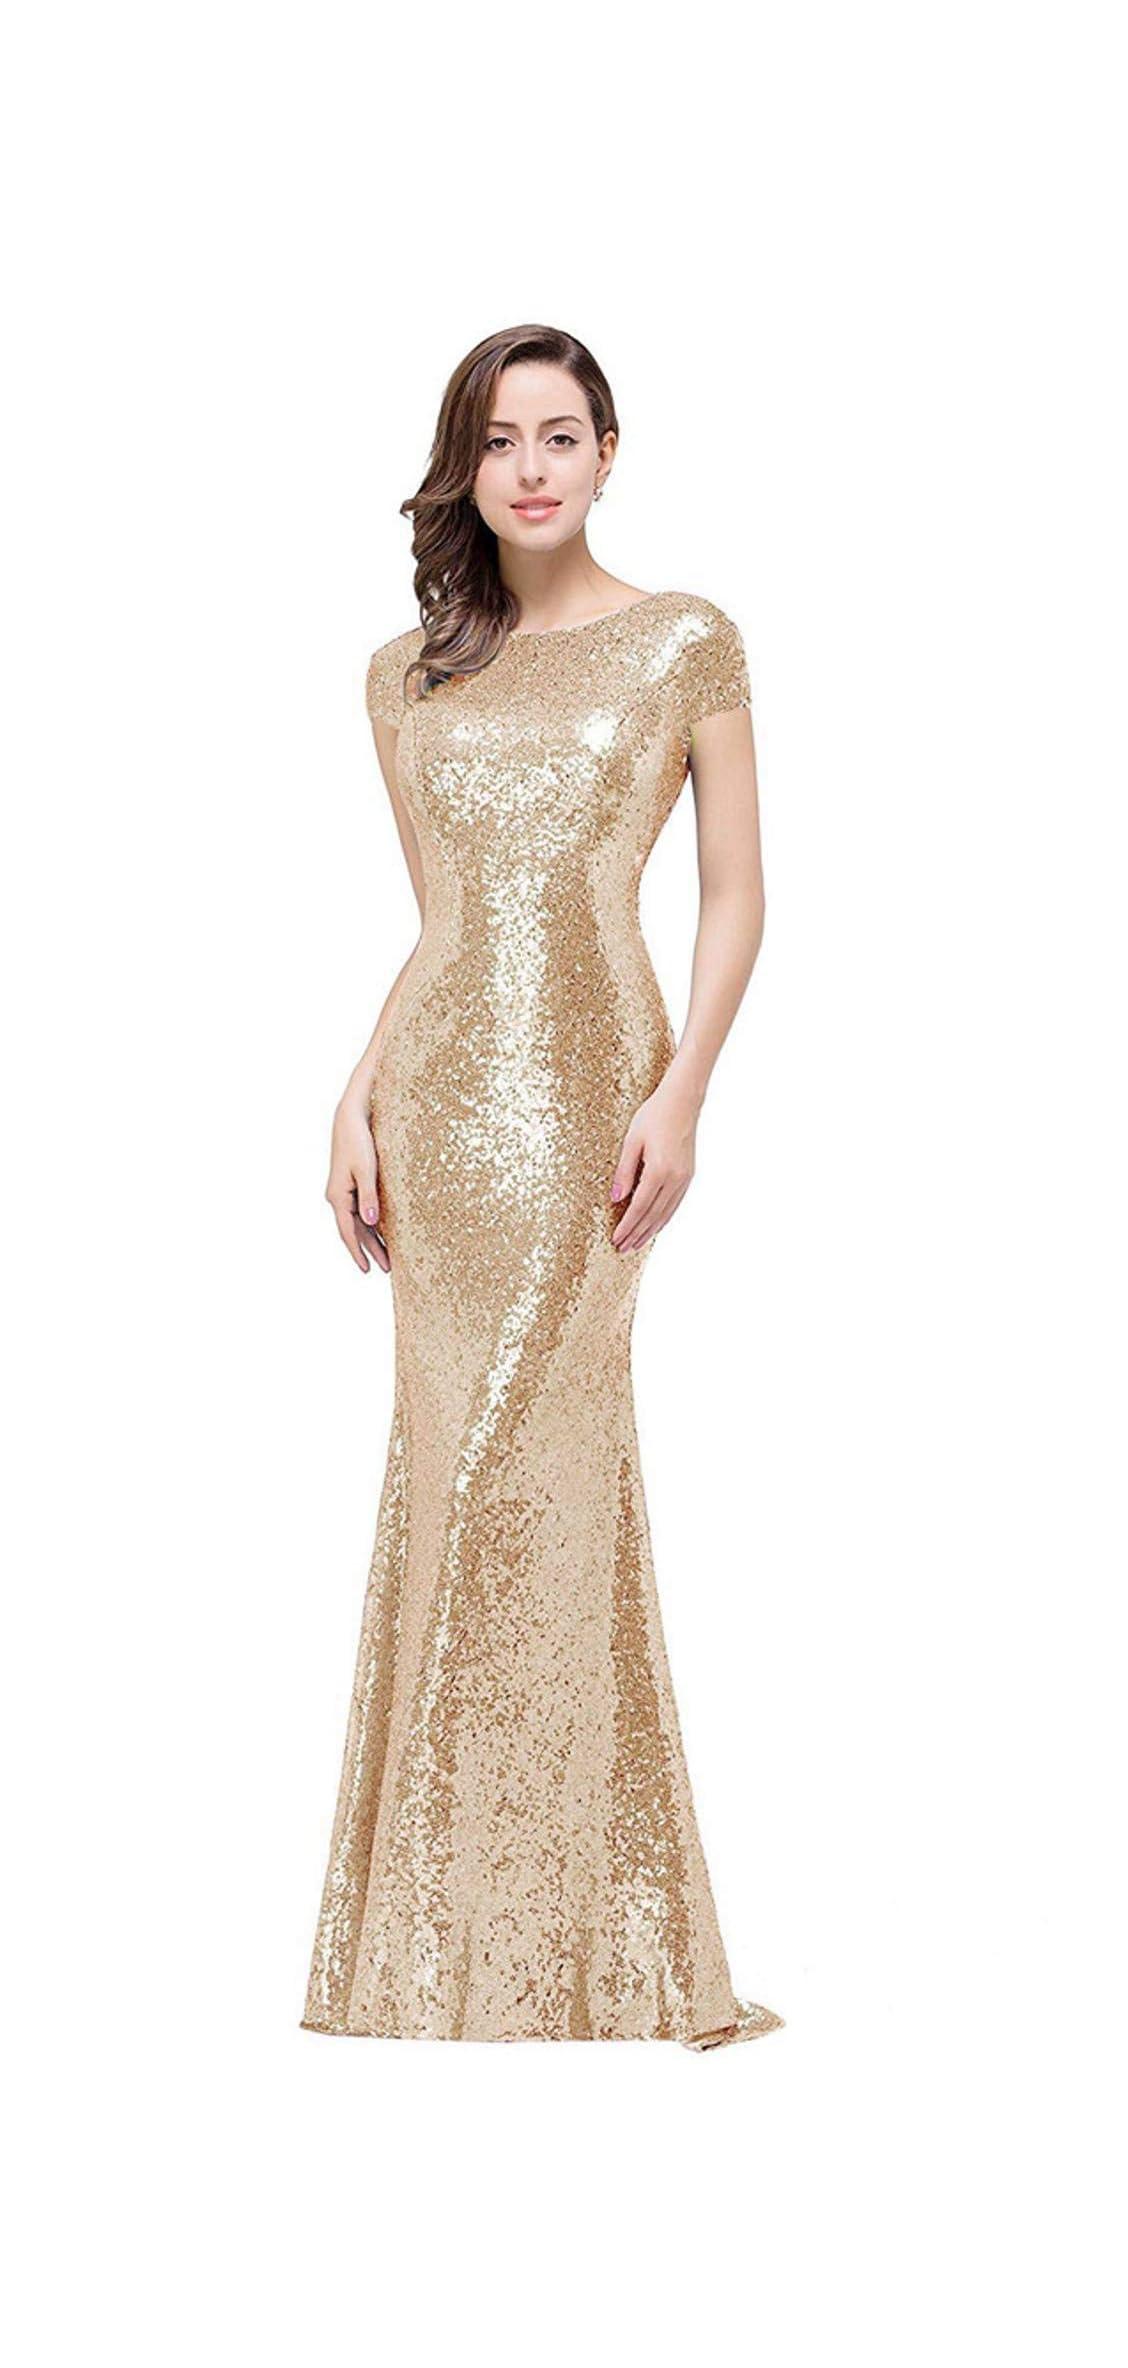 Women Sequins Prom Bridesmaid Dress Glitter Rose Gold